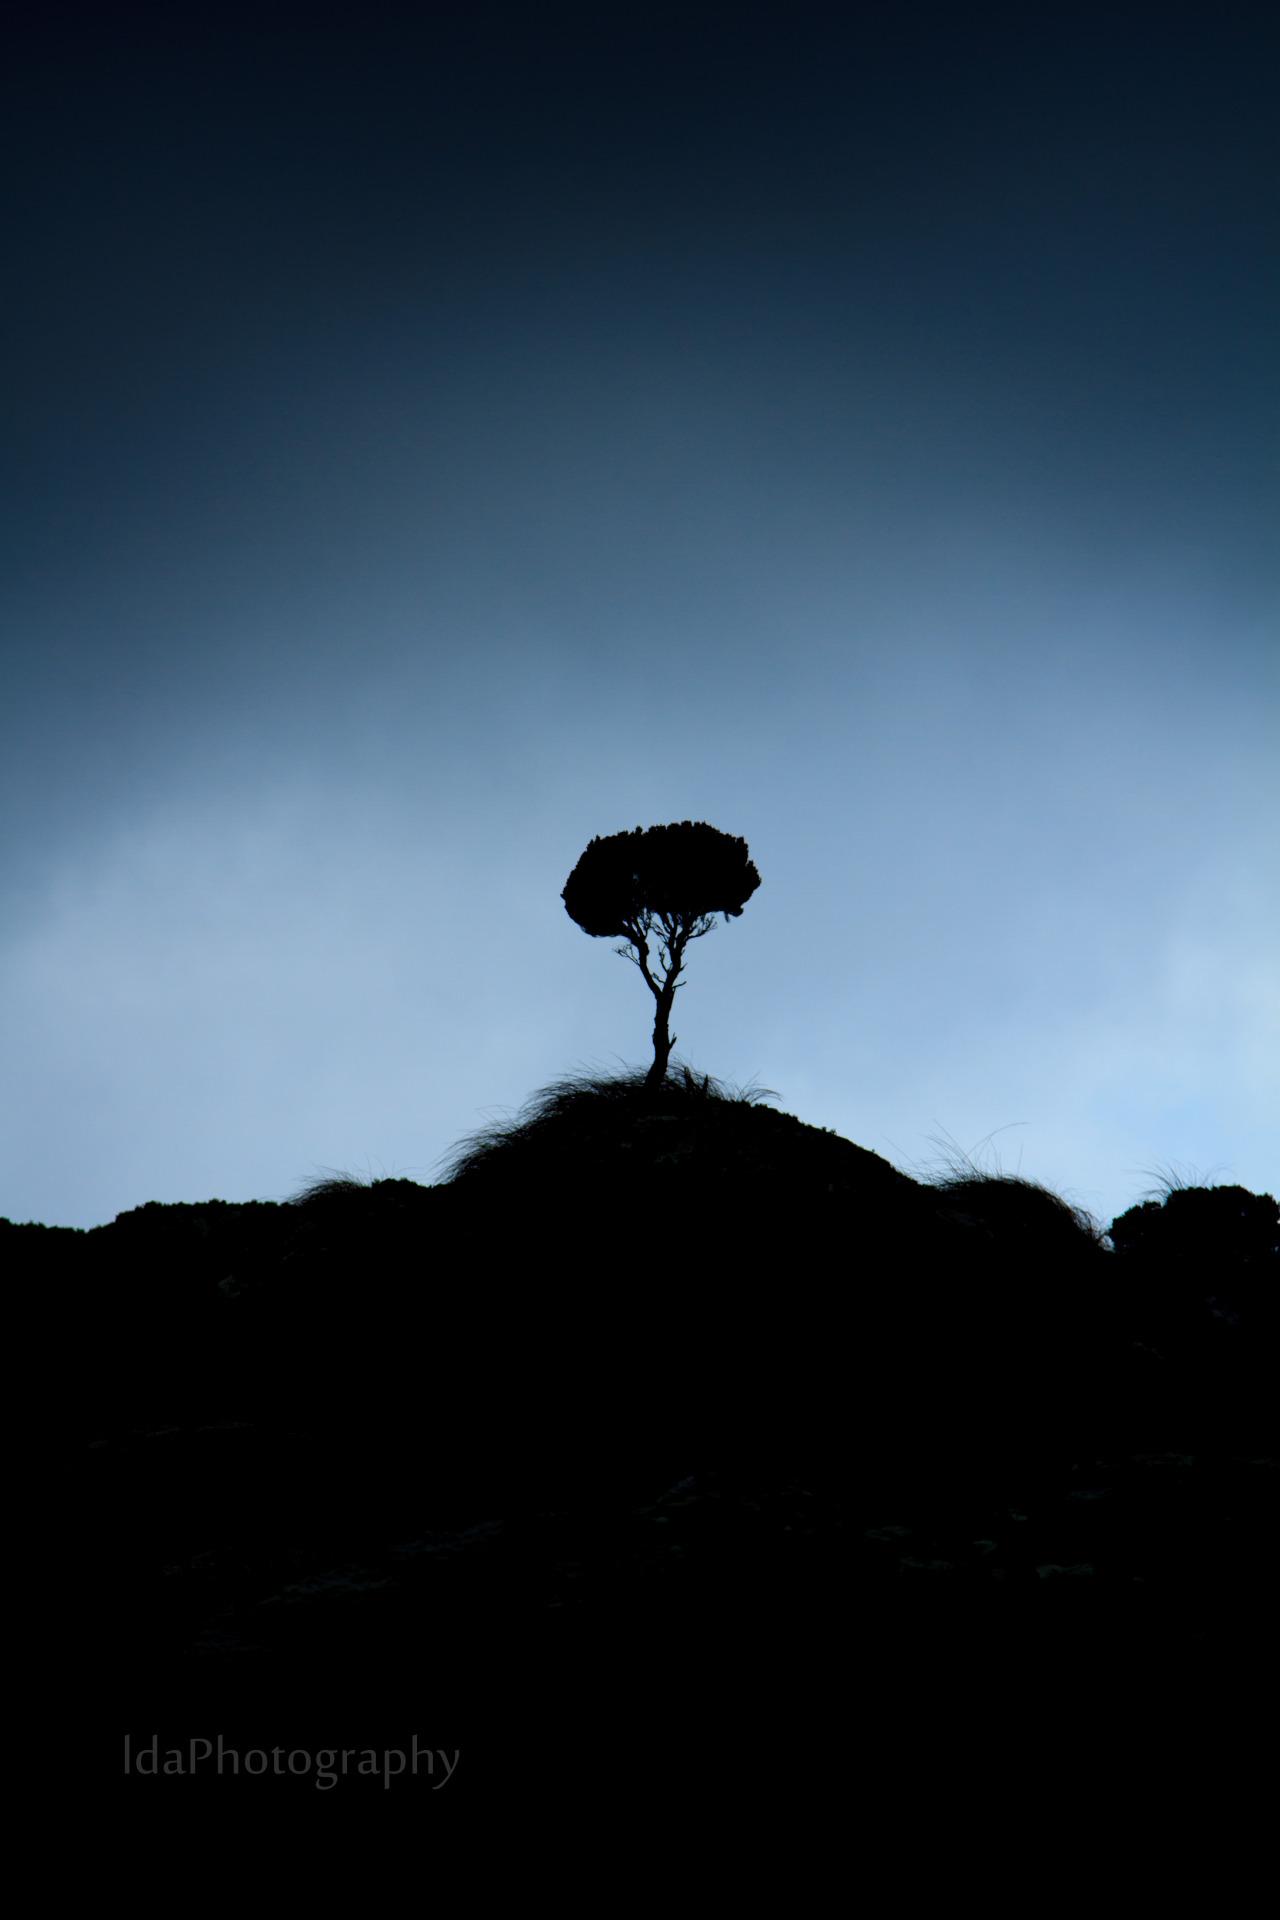 lda-photography: African Bonsai